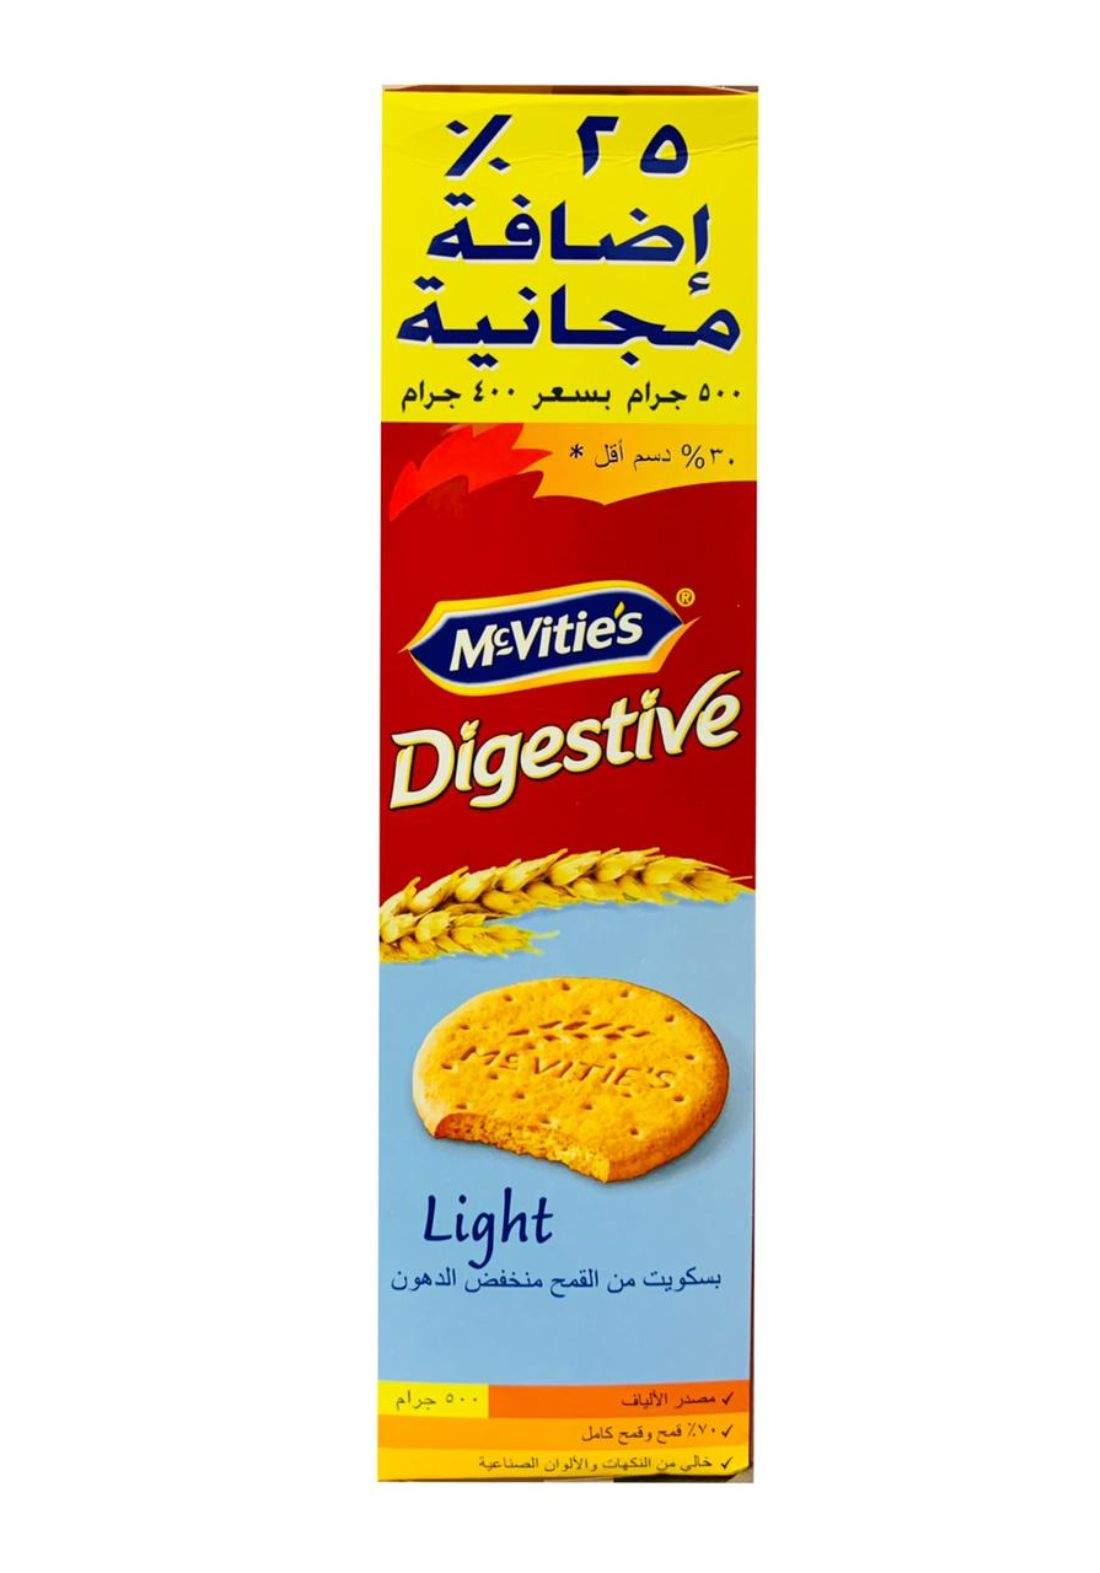 Digestive Biscuits Light 500g  بسكوت دايسجتف لايت